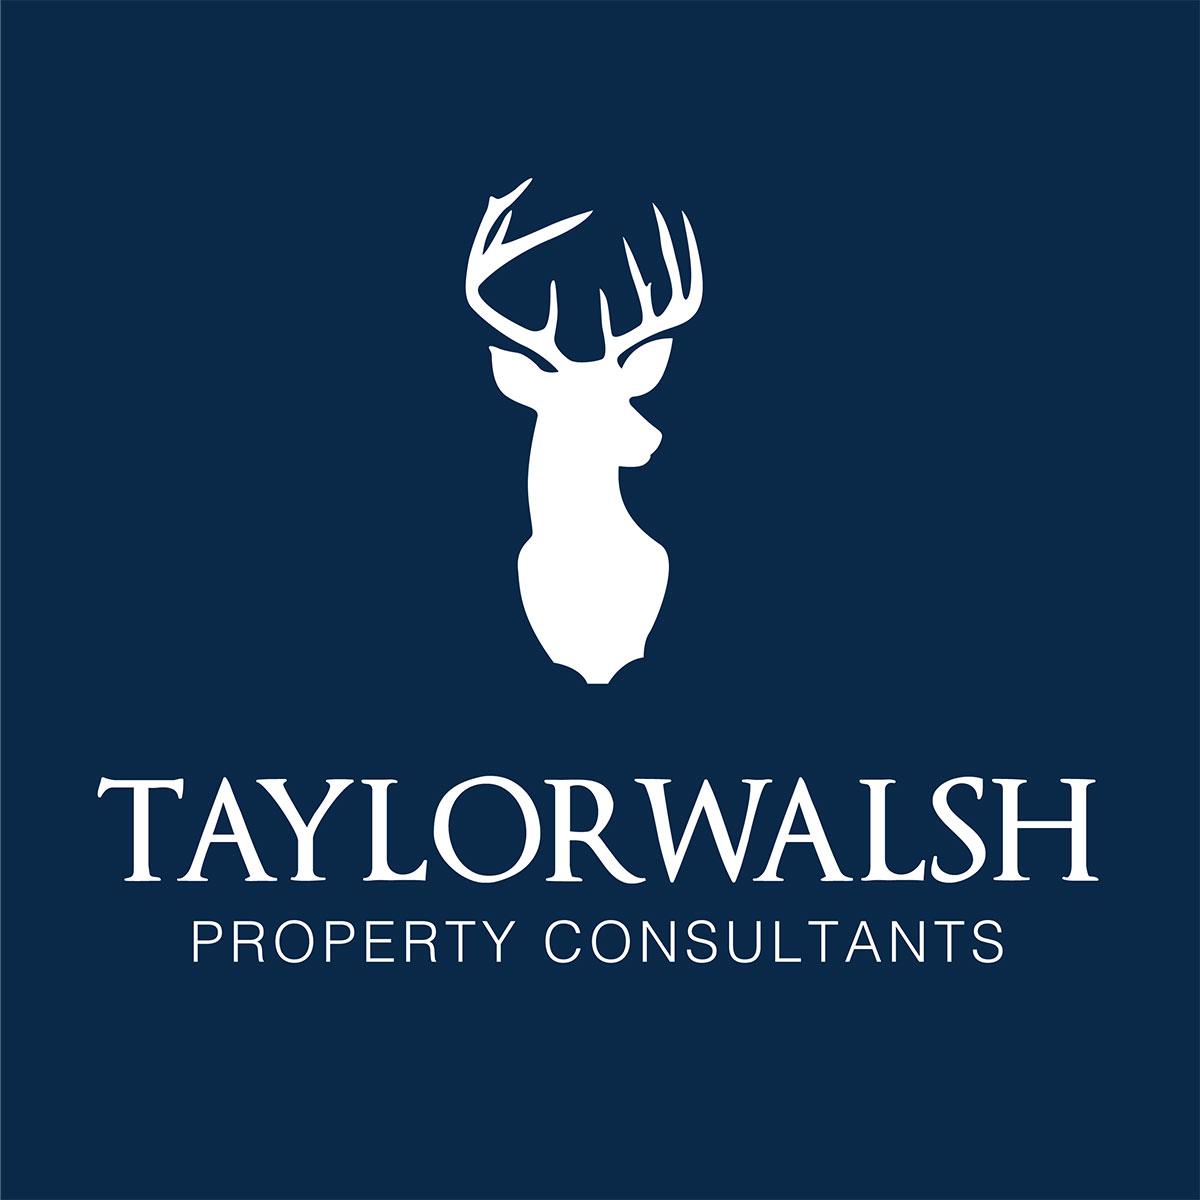 Taylor-walsh-logo-blue.jpg